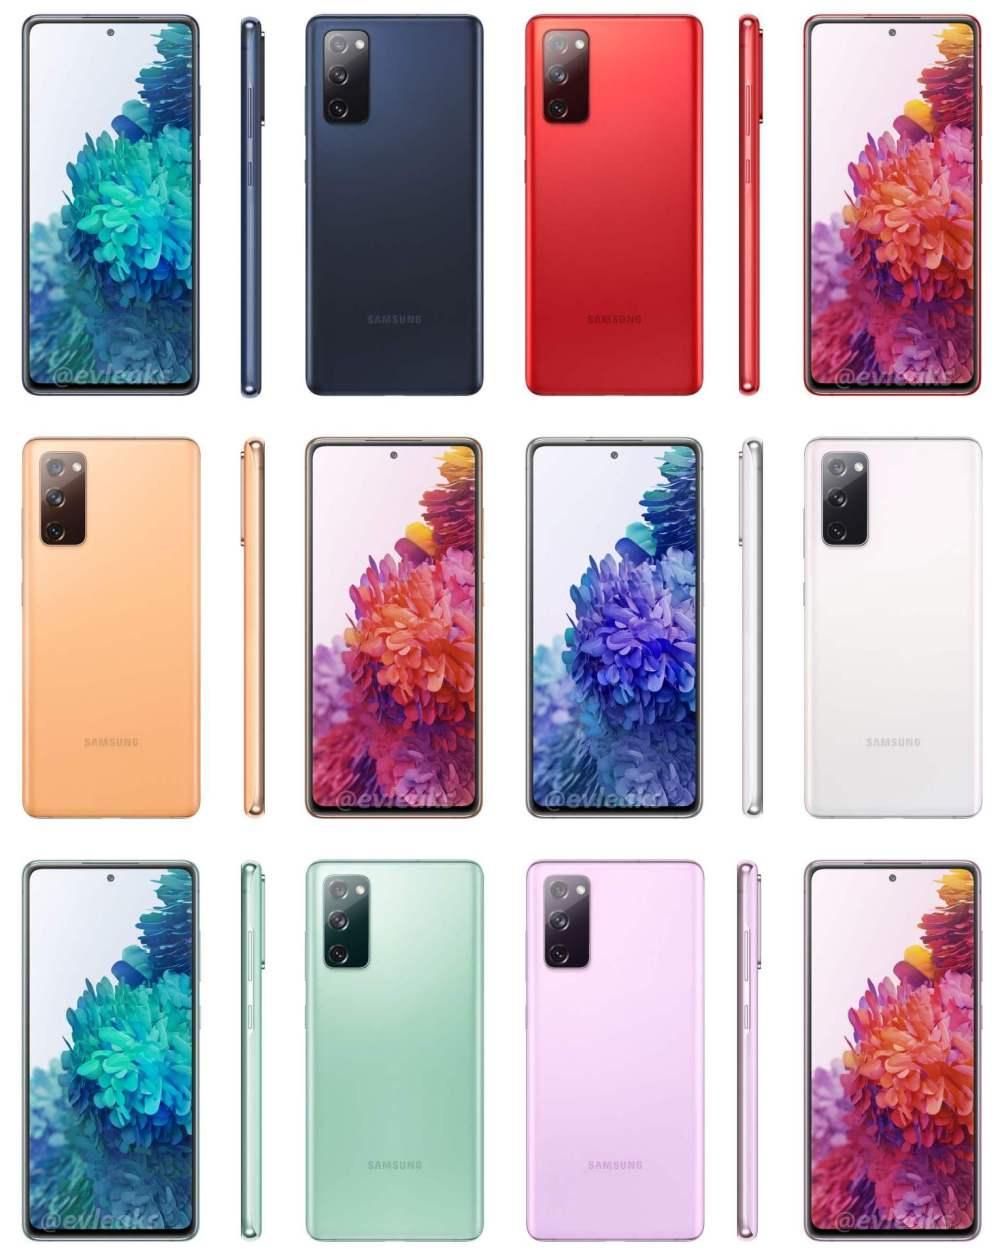 Samsung Galaxy S20 FE colour options